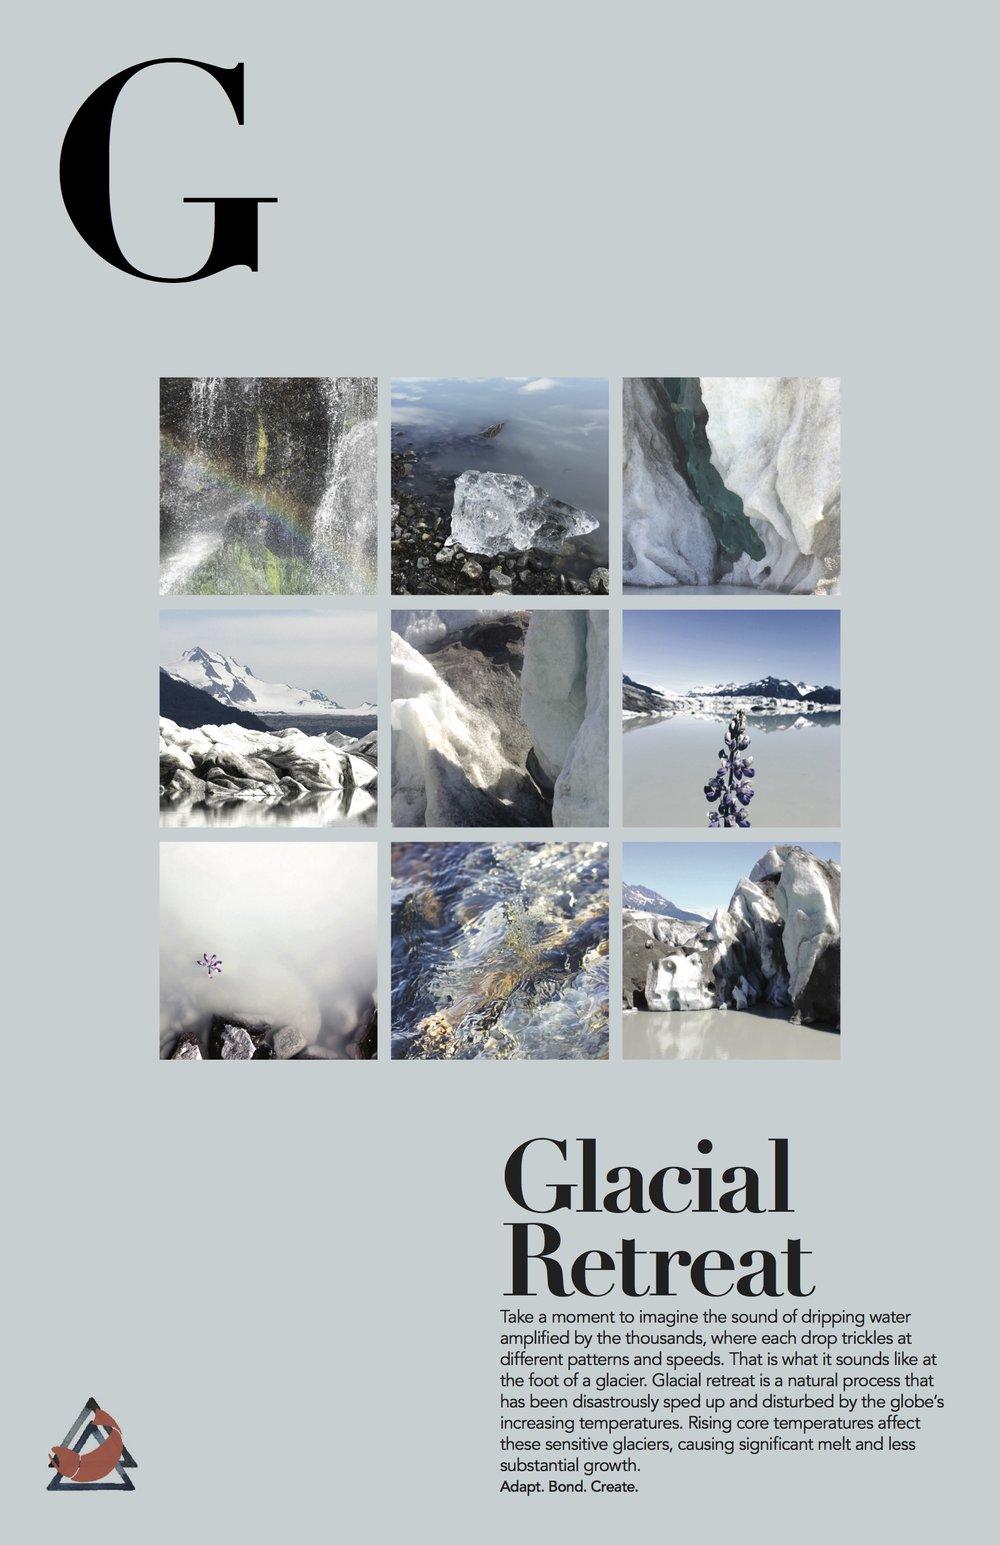 glacialretreat_final.jpg